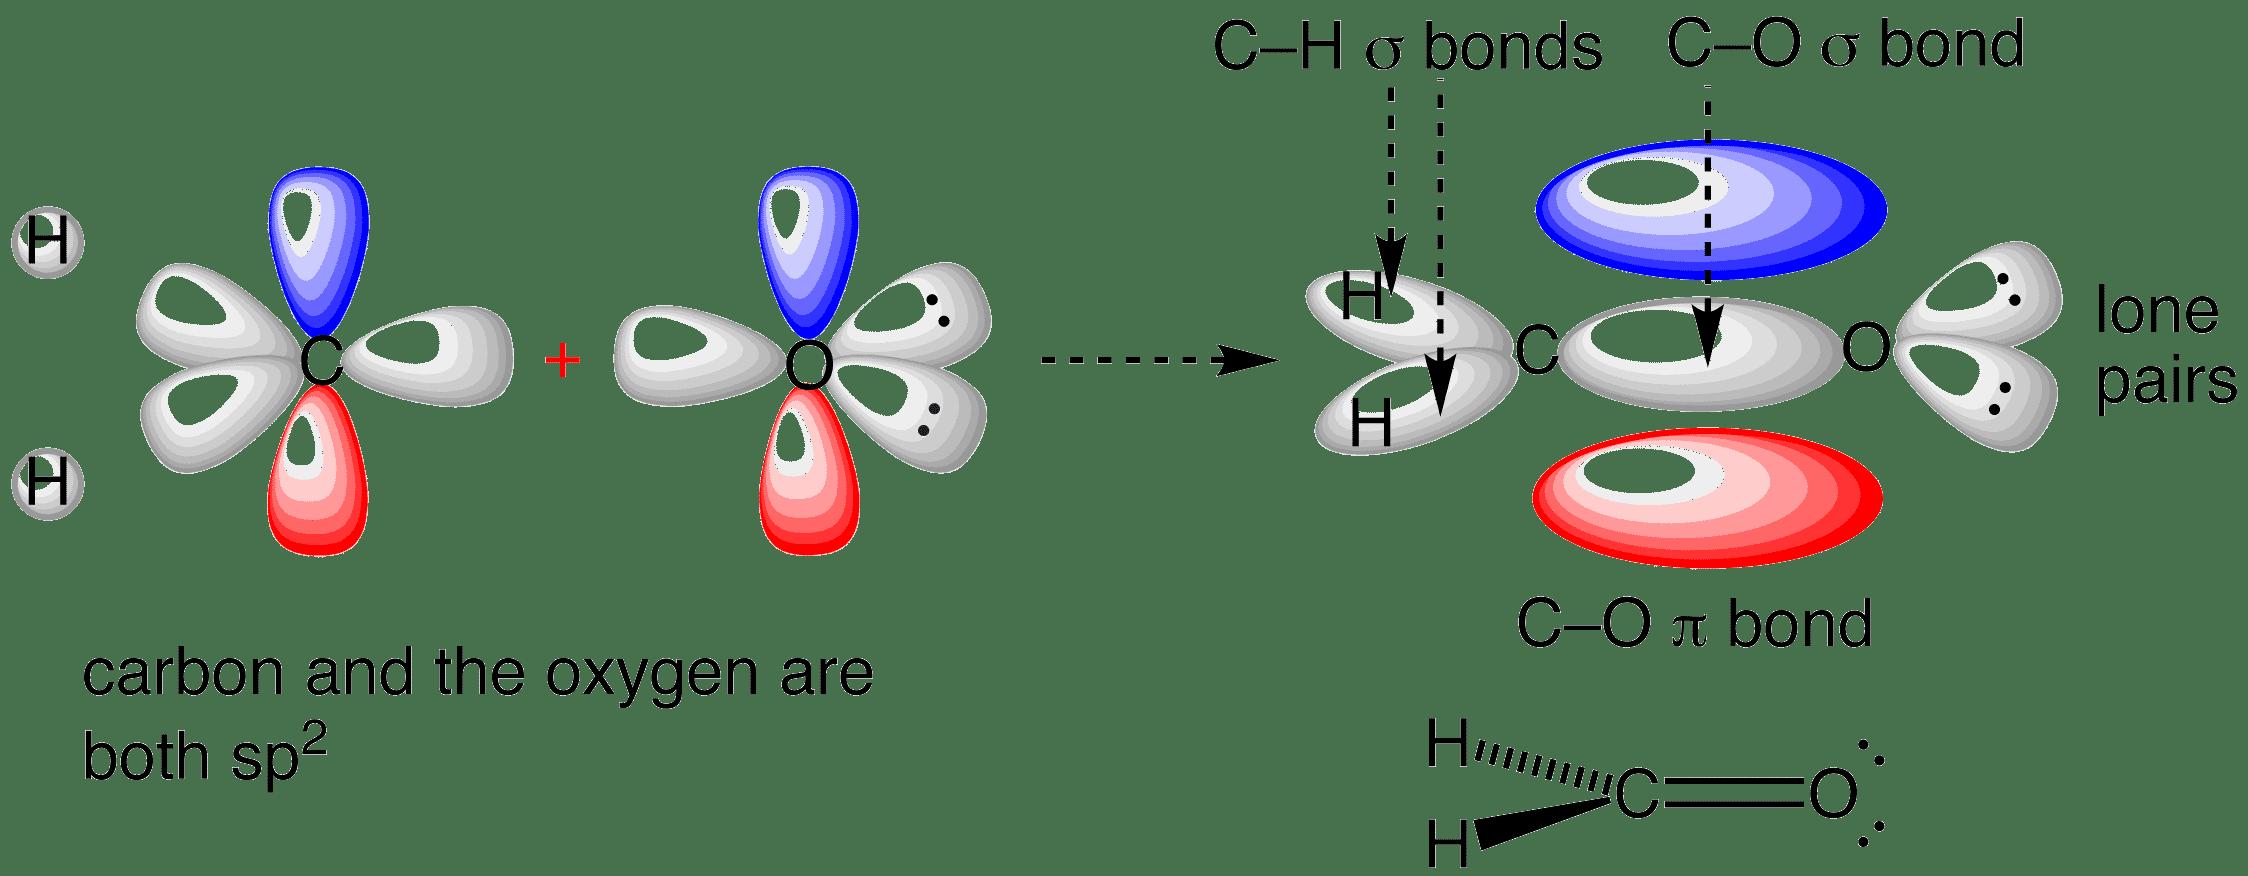 formaldehyde orbitals